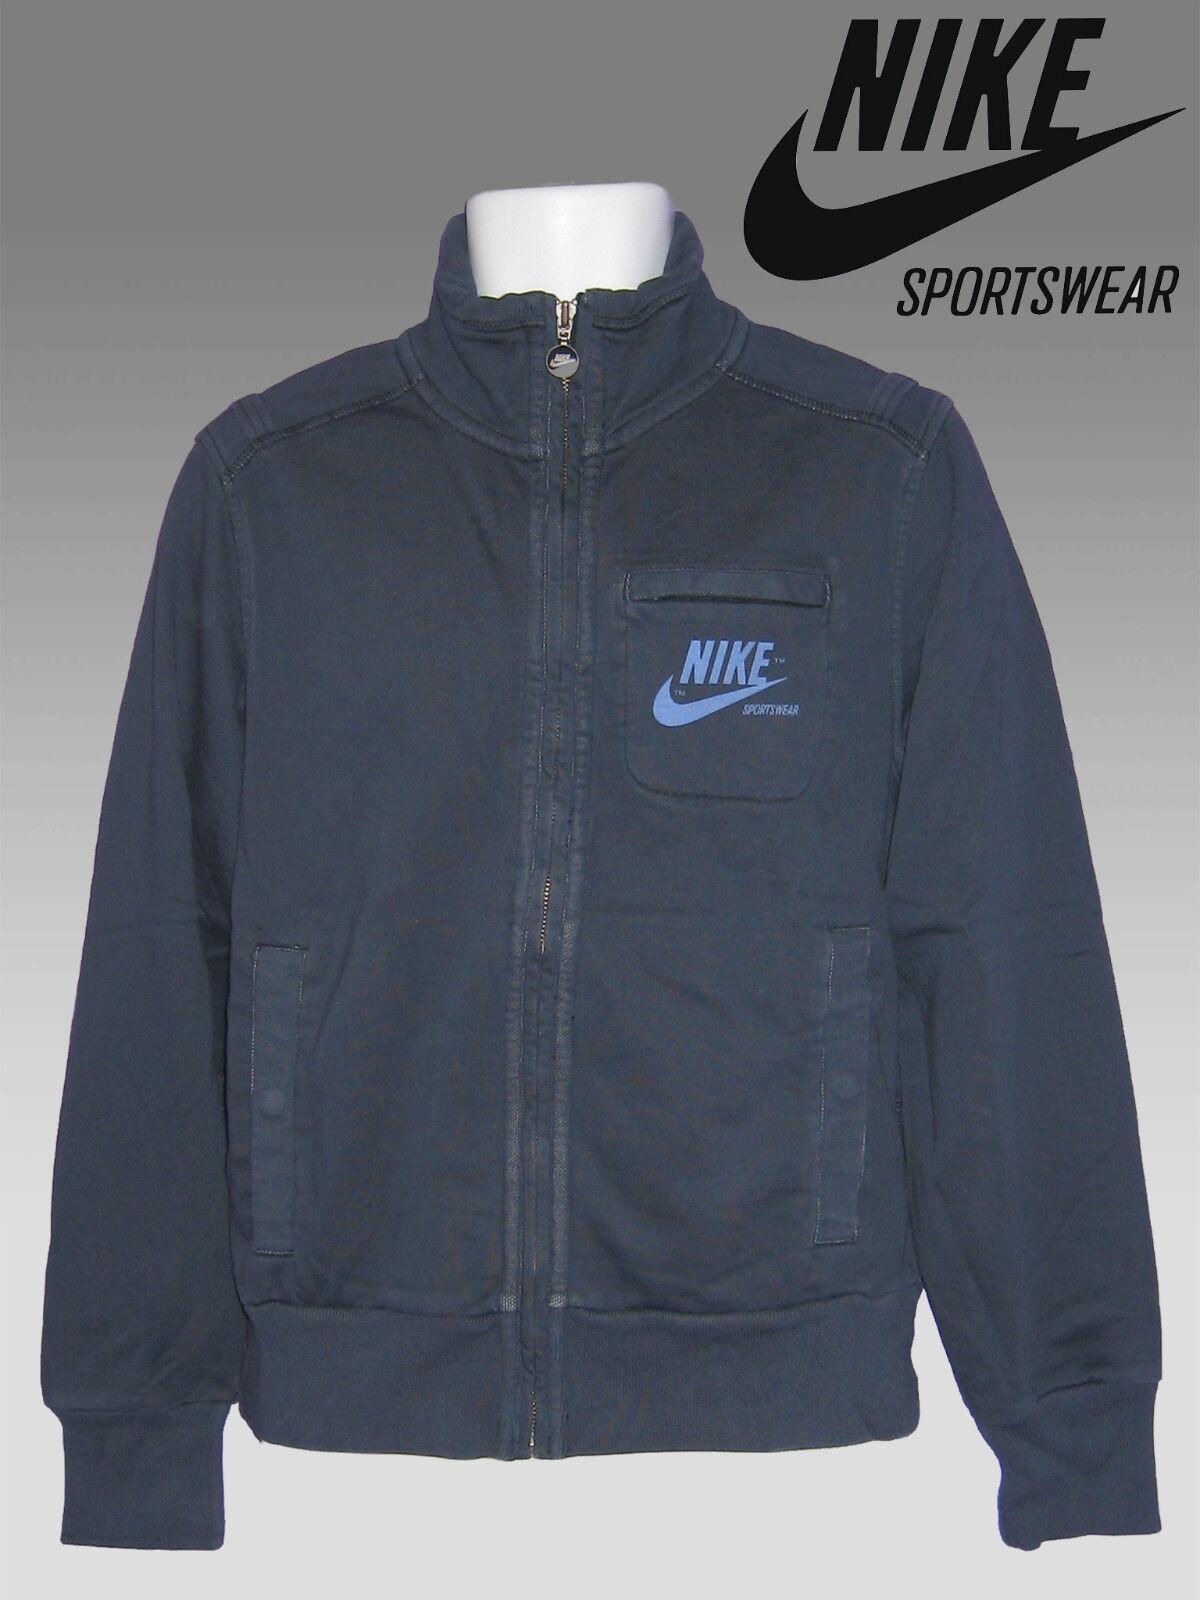 NEW NIKE Sportswear NSW Vintage Distressed Fleece Cotton Jacket Navy Blau M